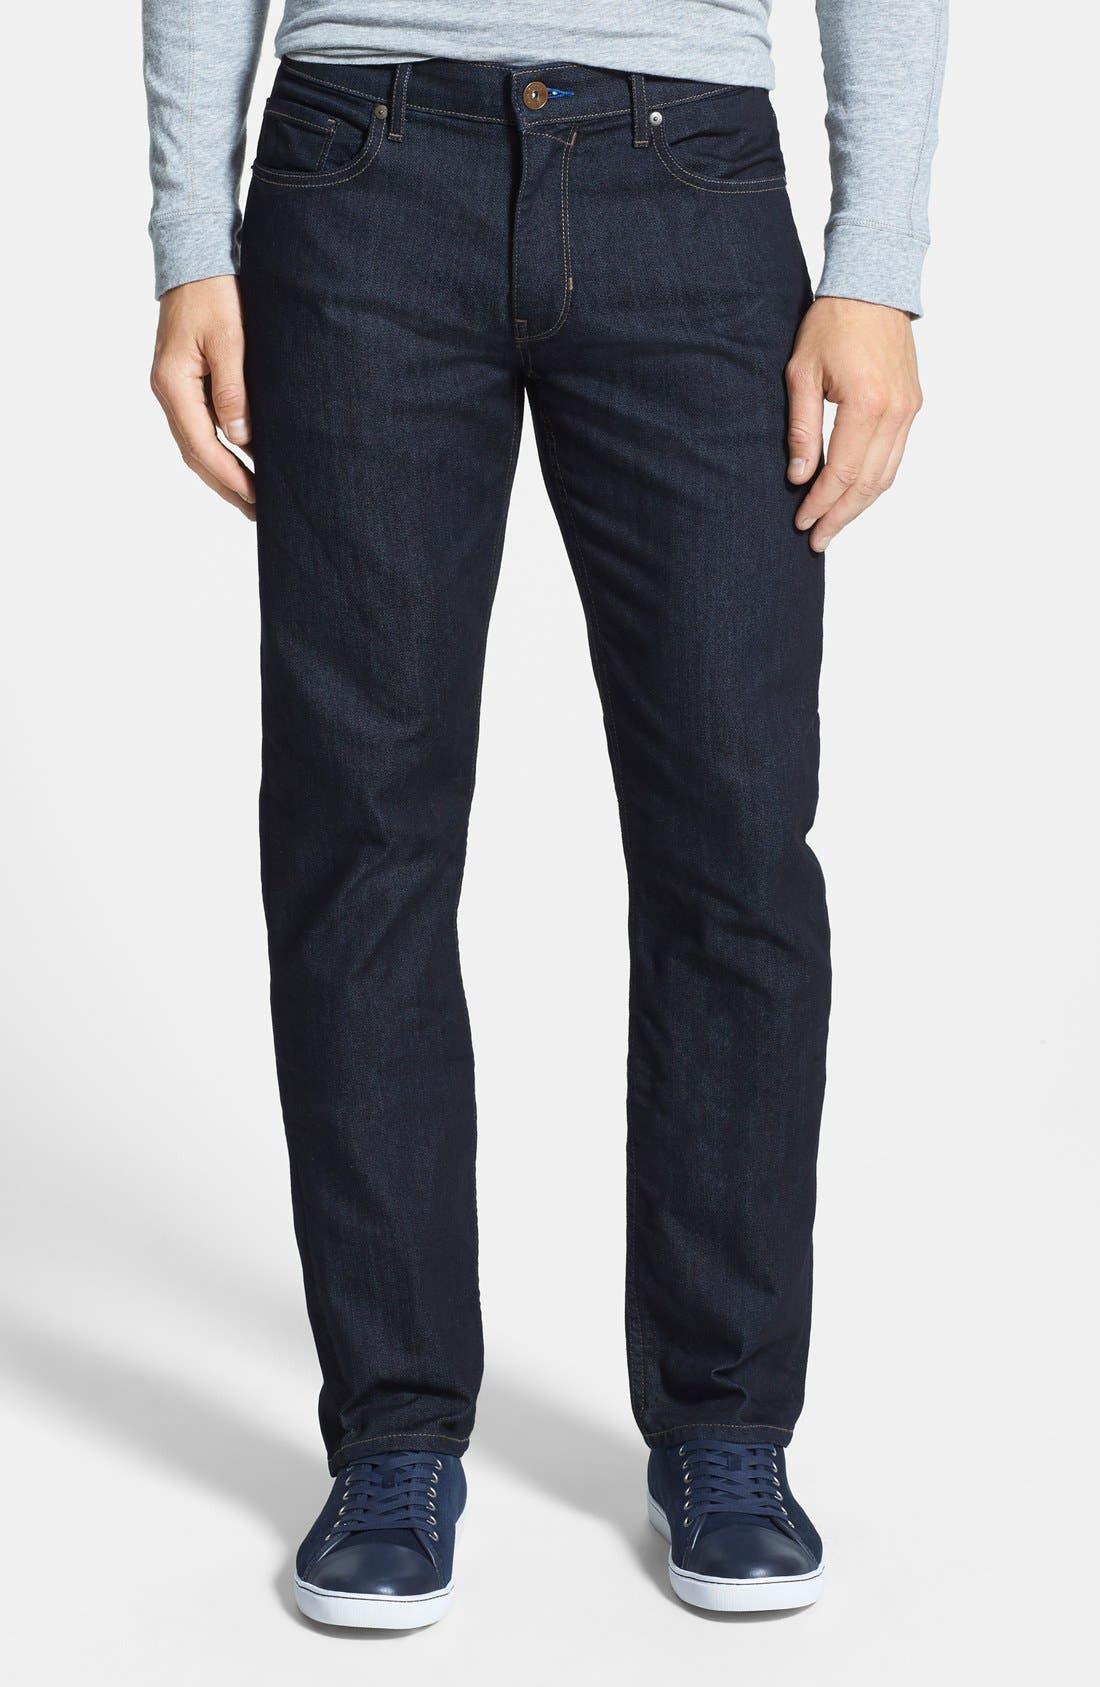 PAIGE 'Normandie' Straight Leg Jeans (Backstage)